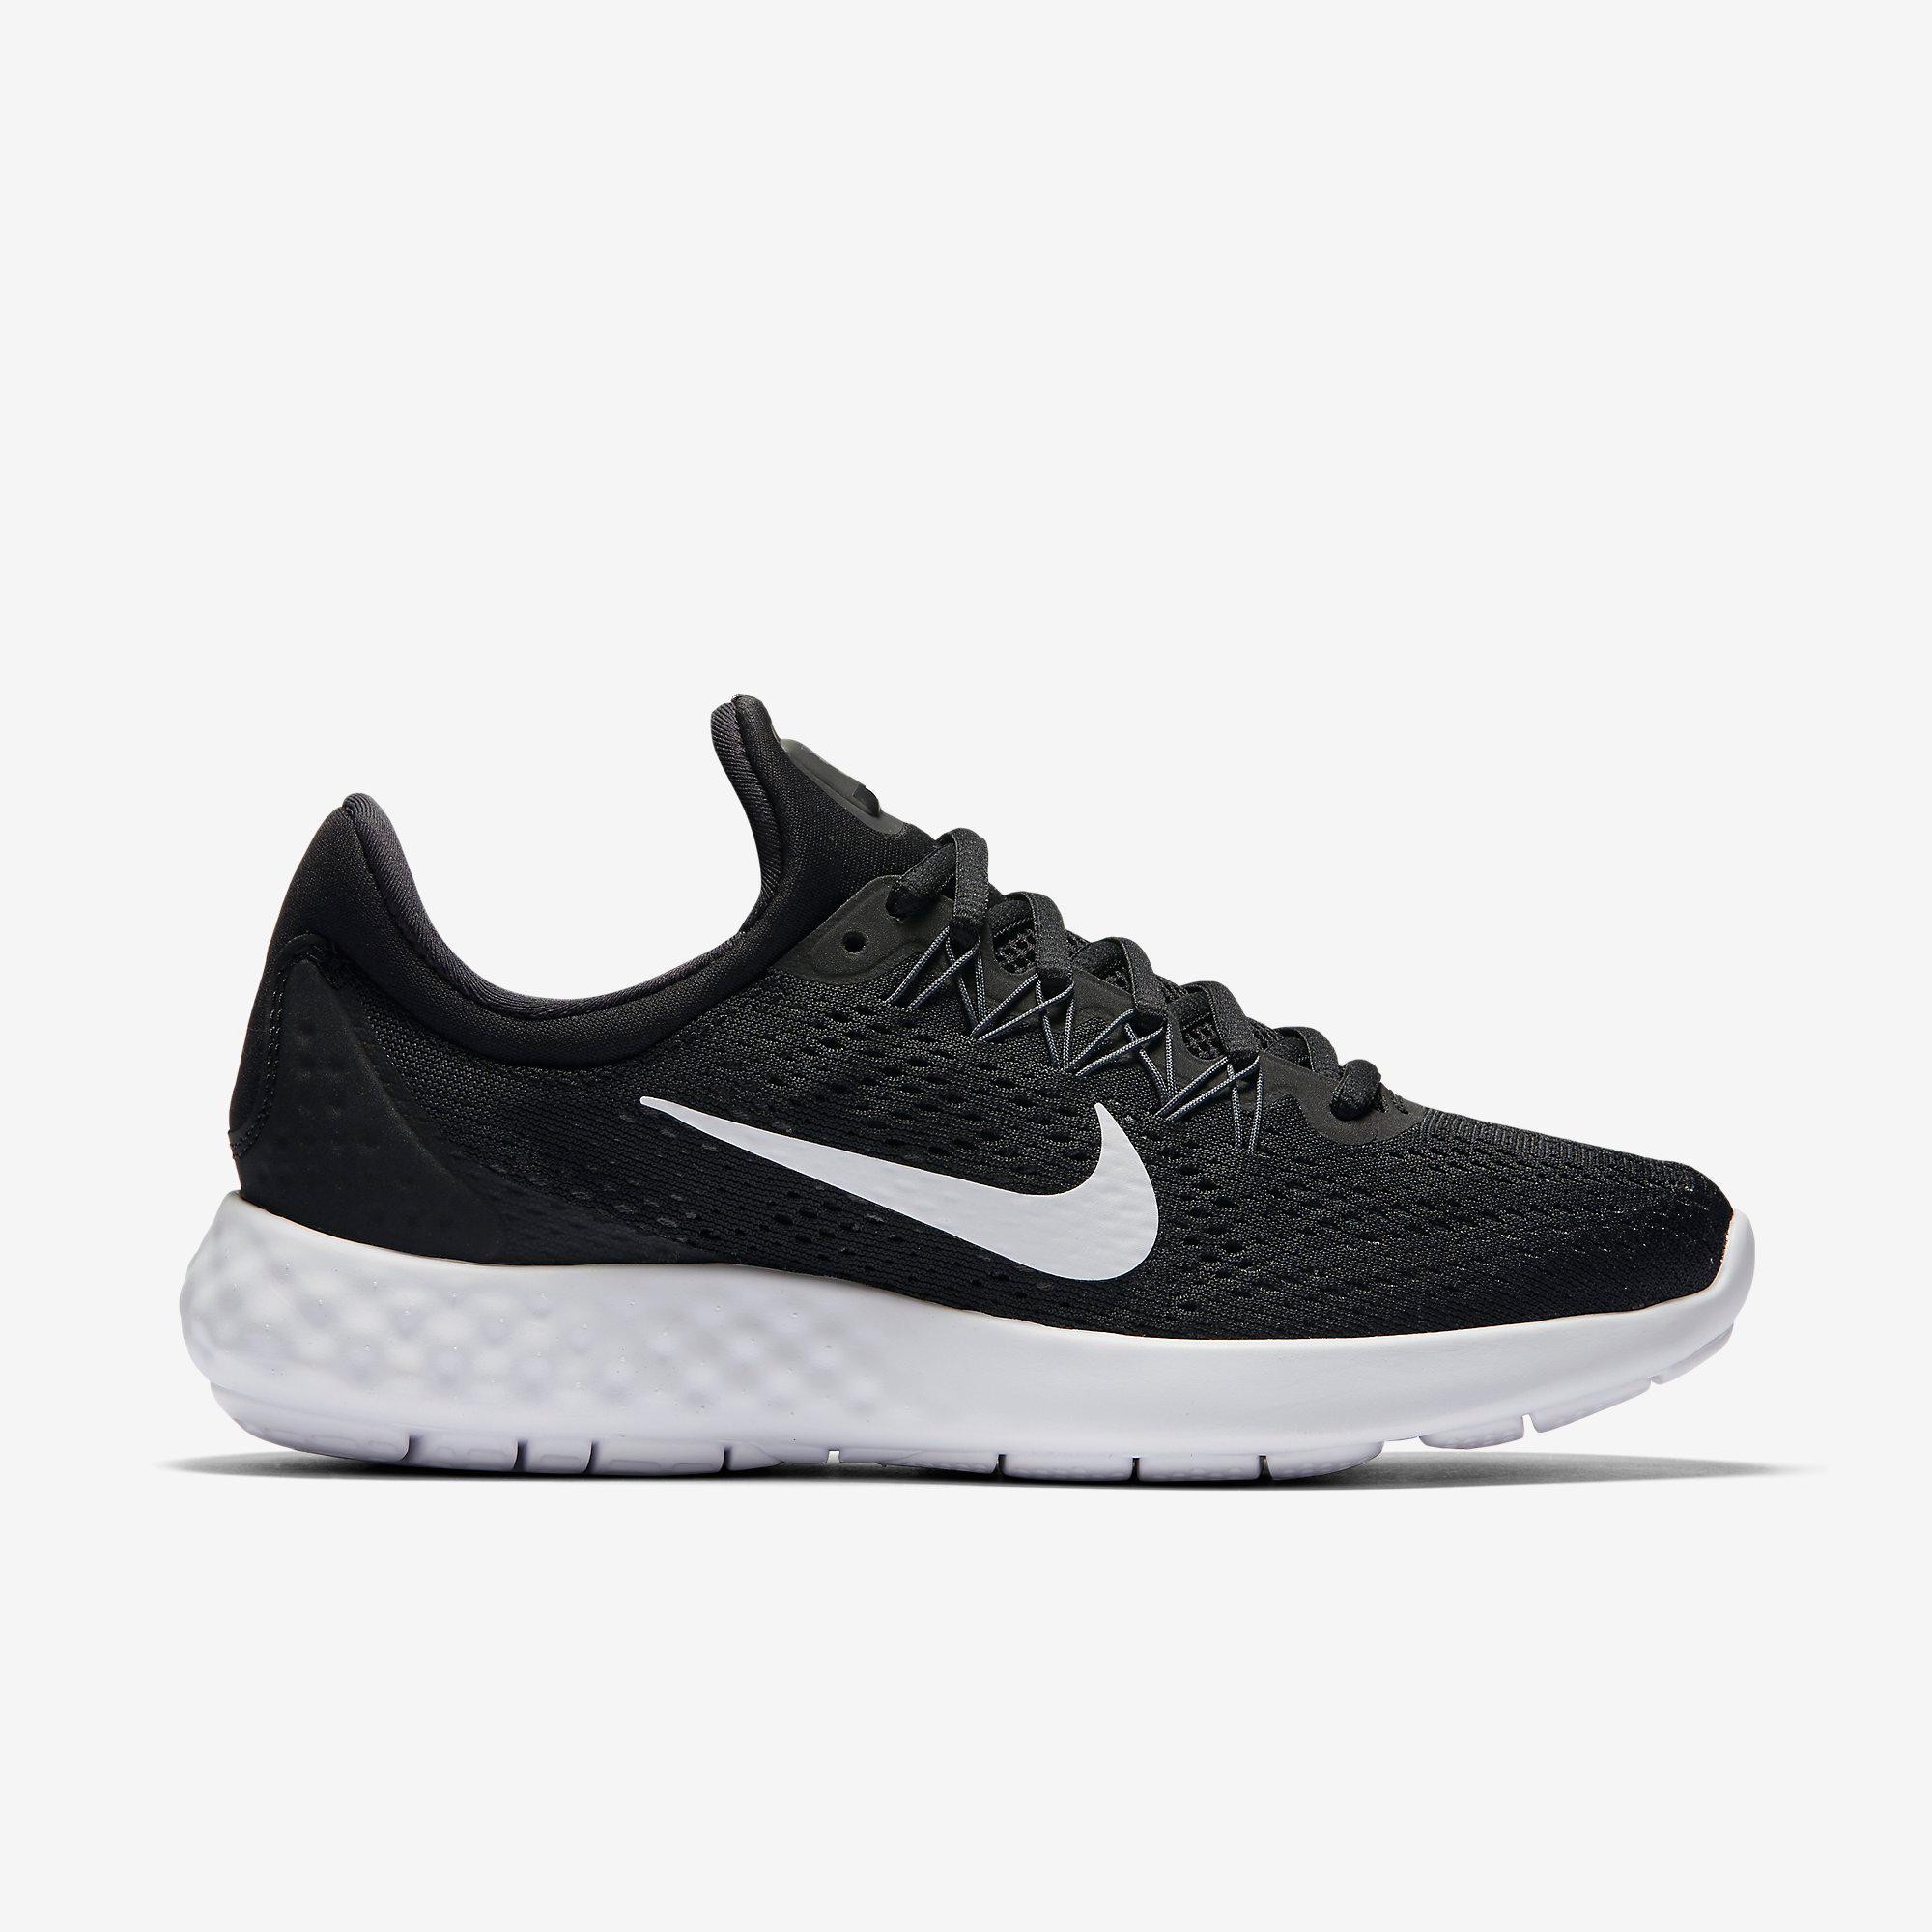 Nike Womens Lunar Skyelux Running Shoes